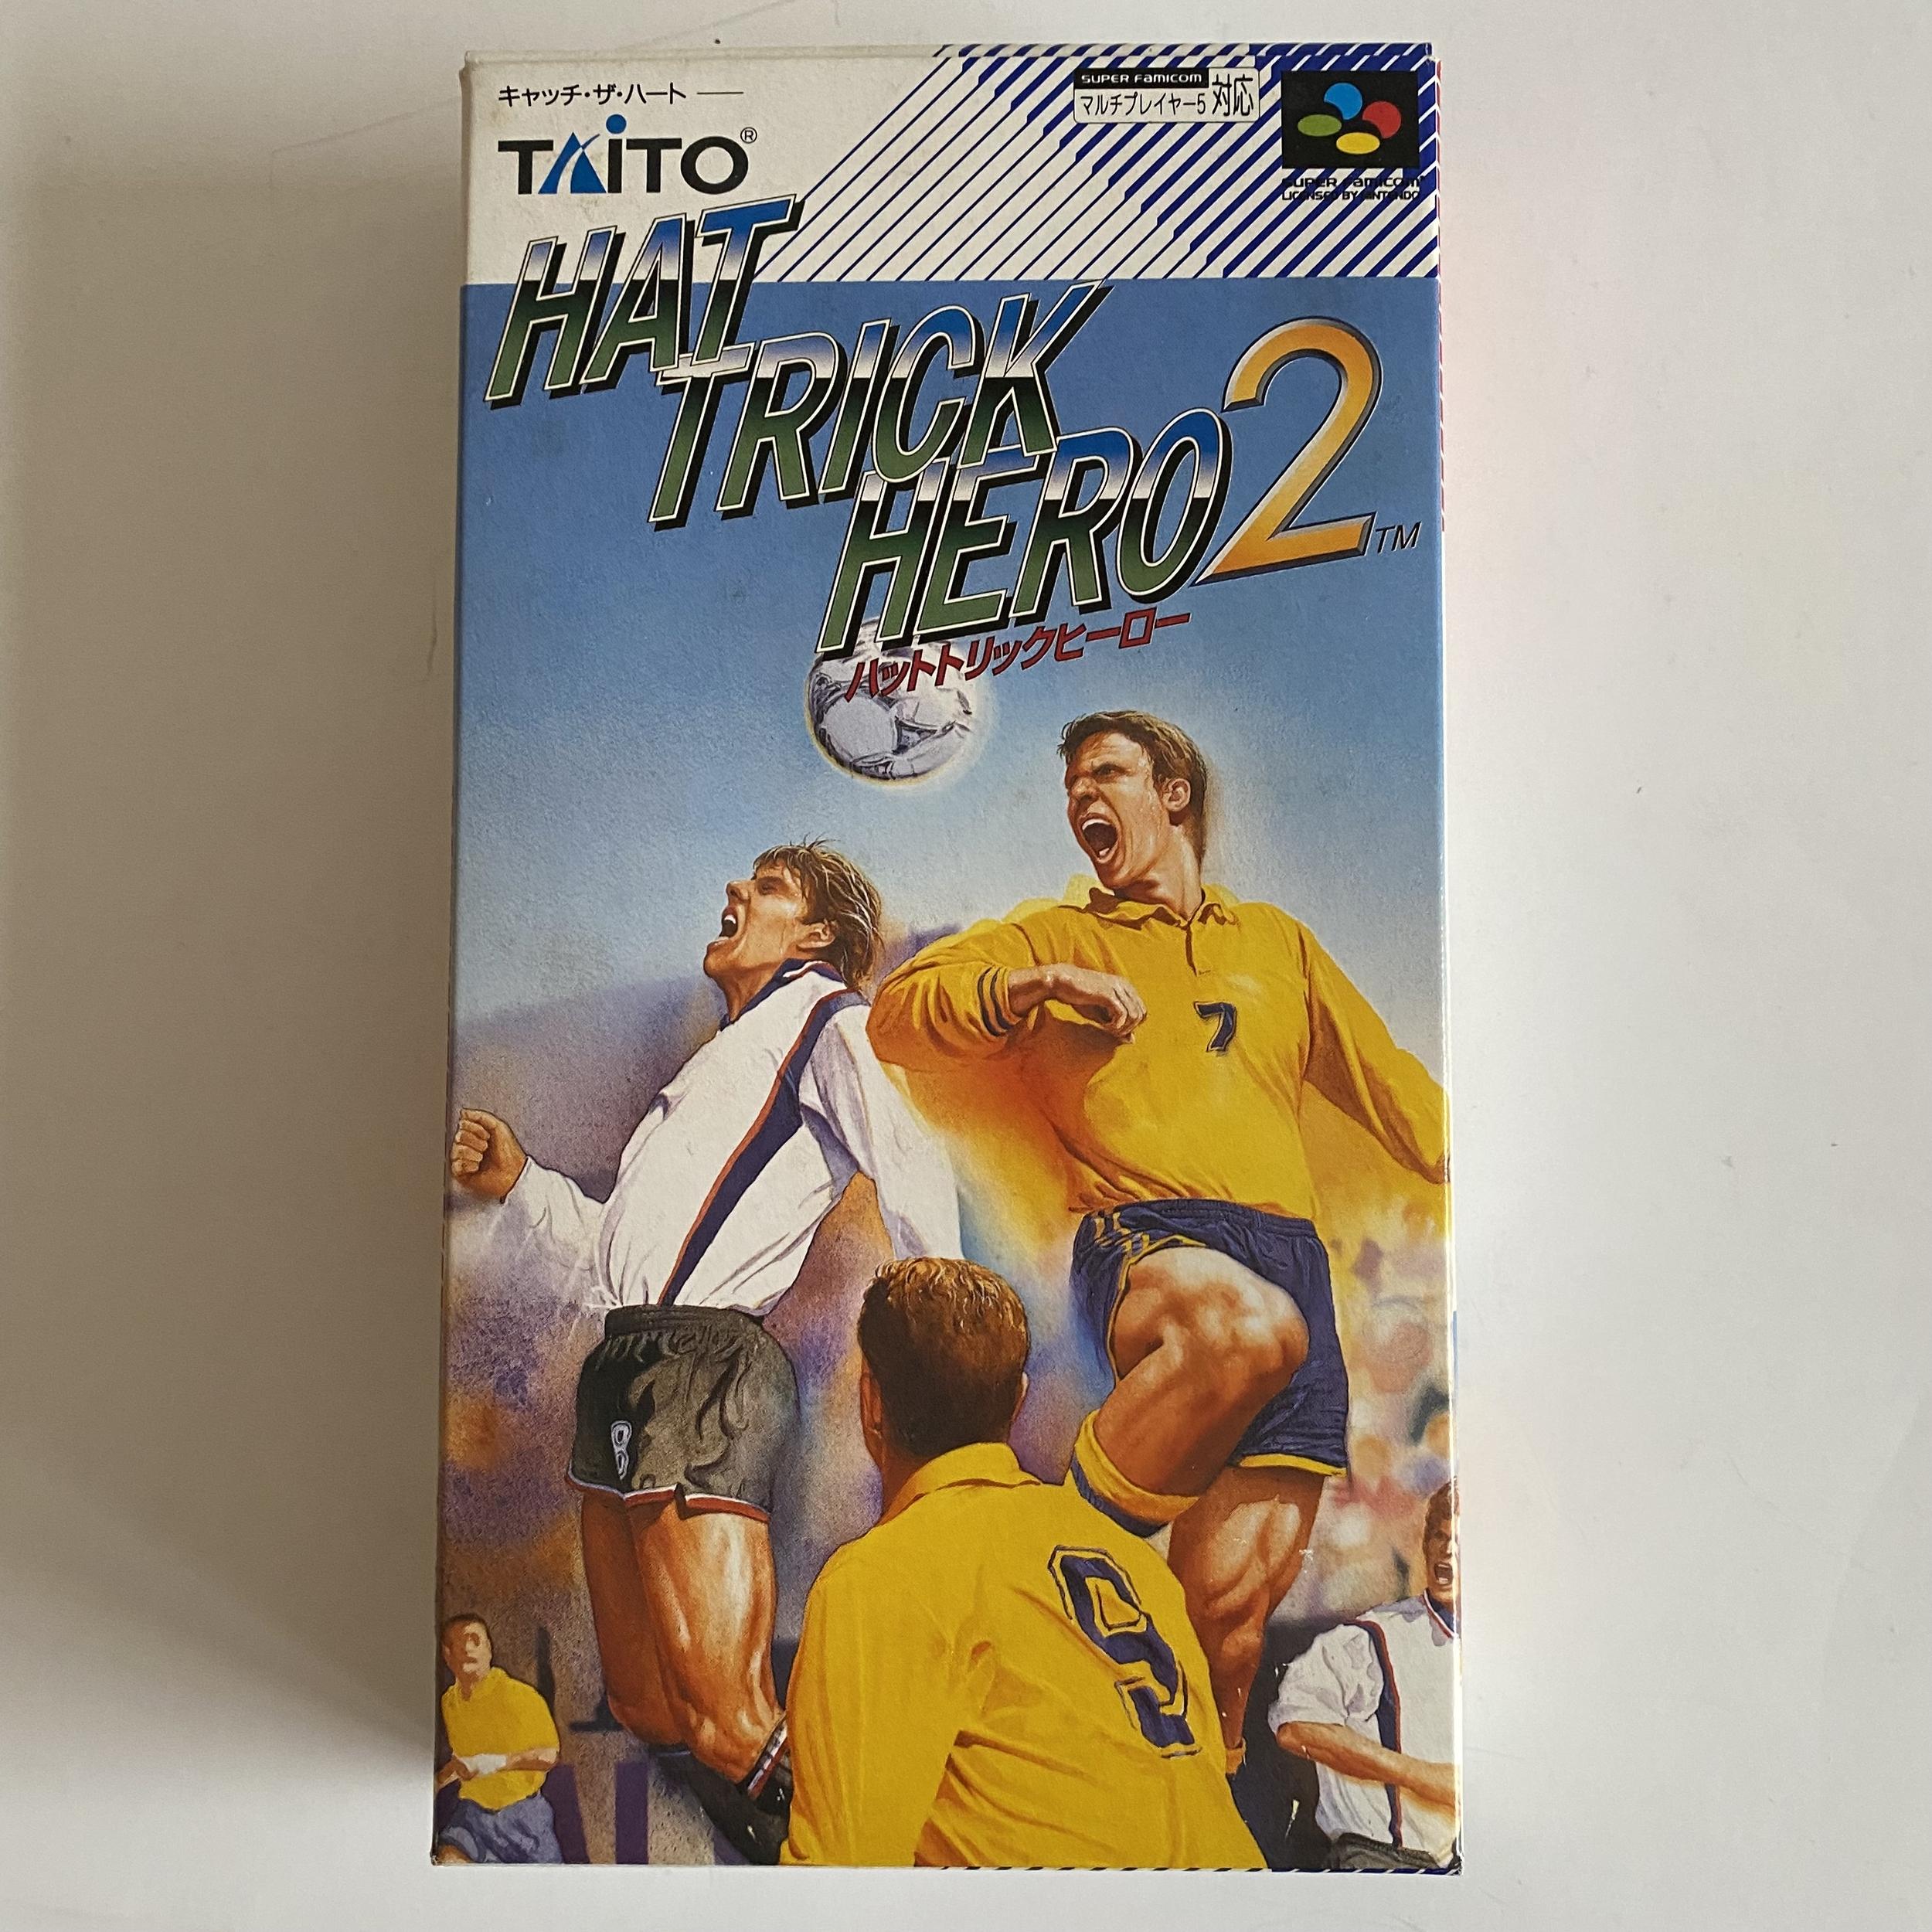 Hat Trick Hero 2 - Super Famicom